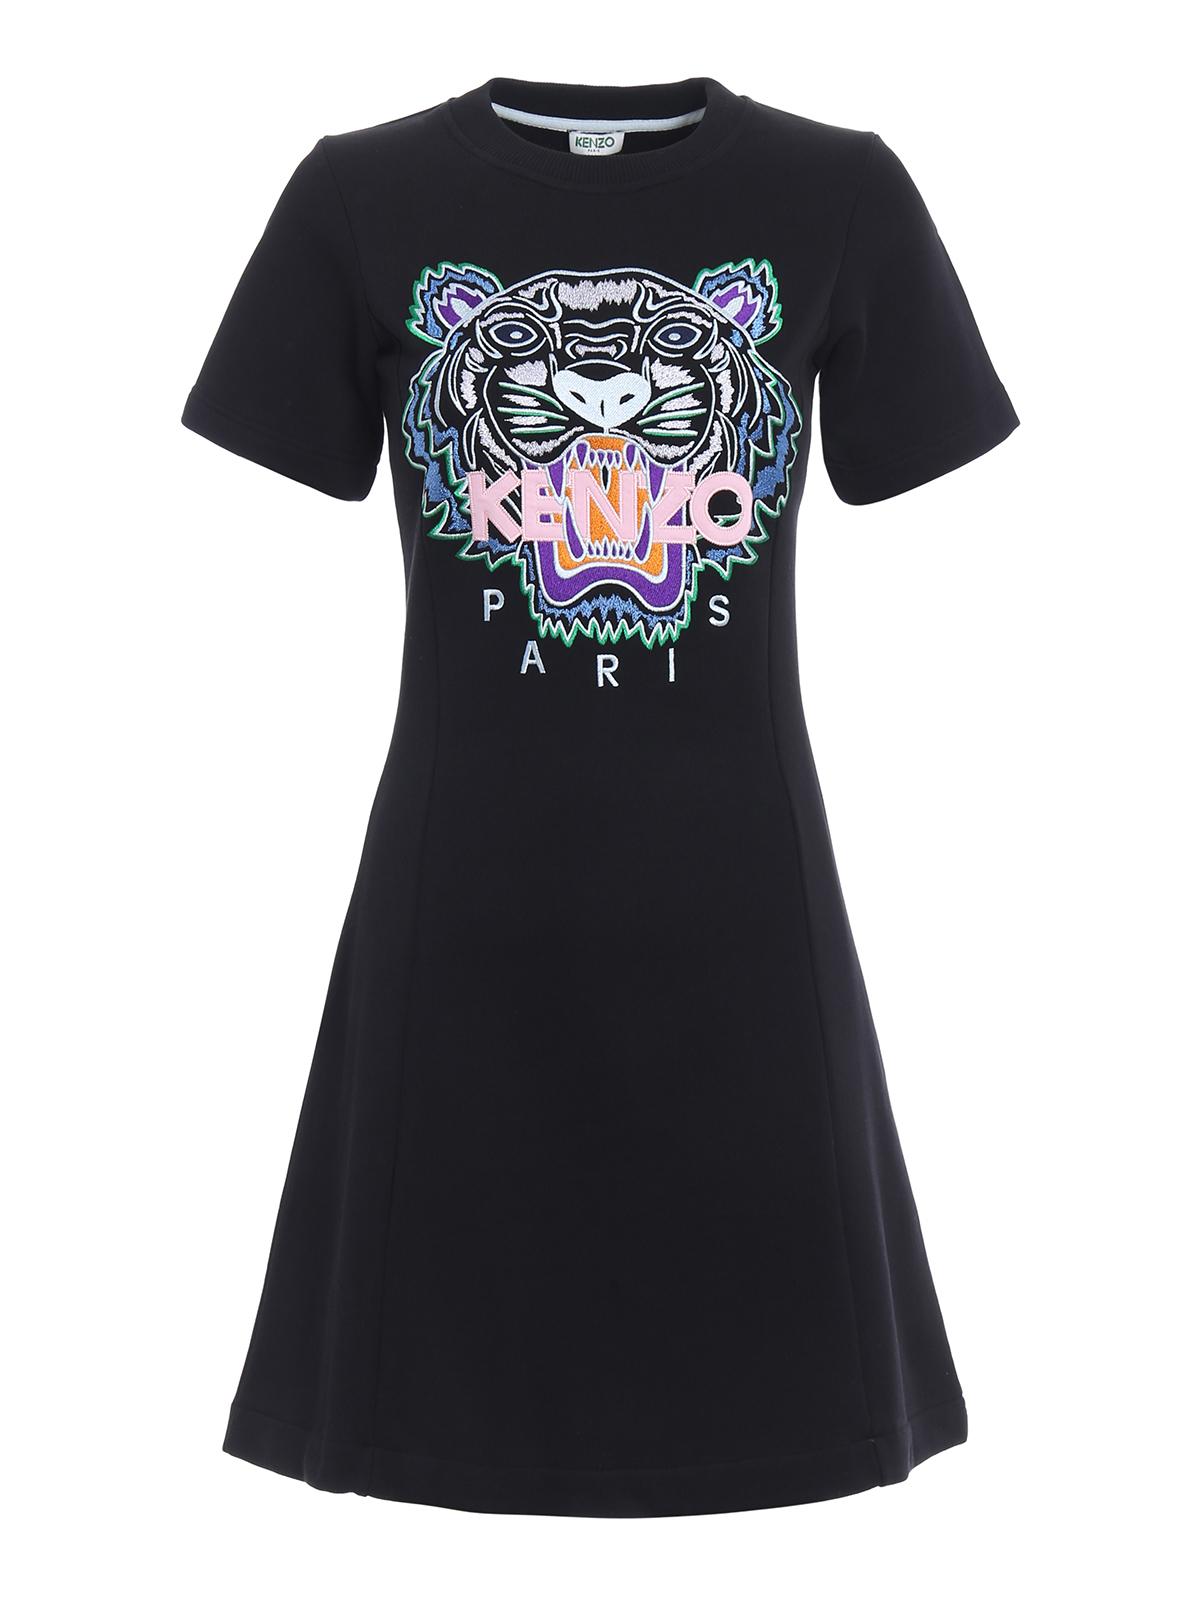 b74b5d87 Kenzo - Tiger embroidery flare summer dress - short dresses ...